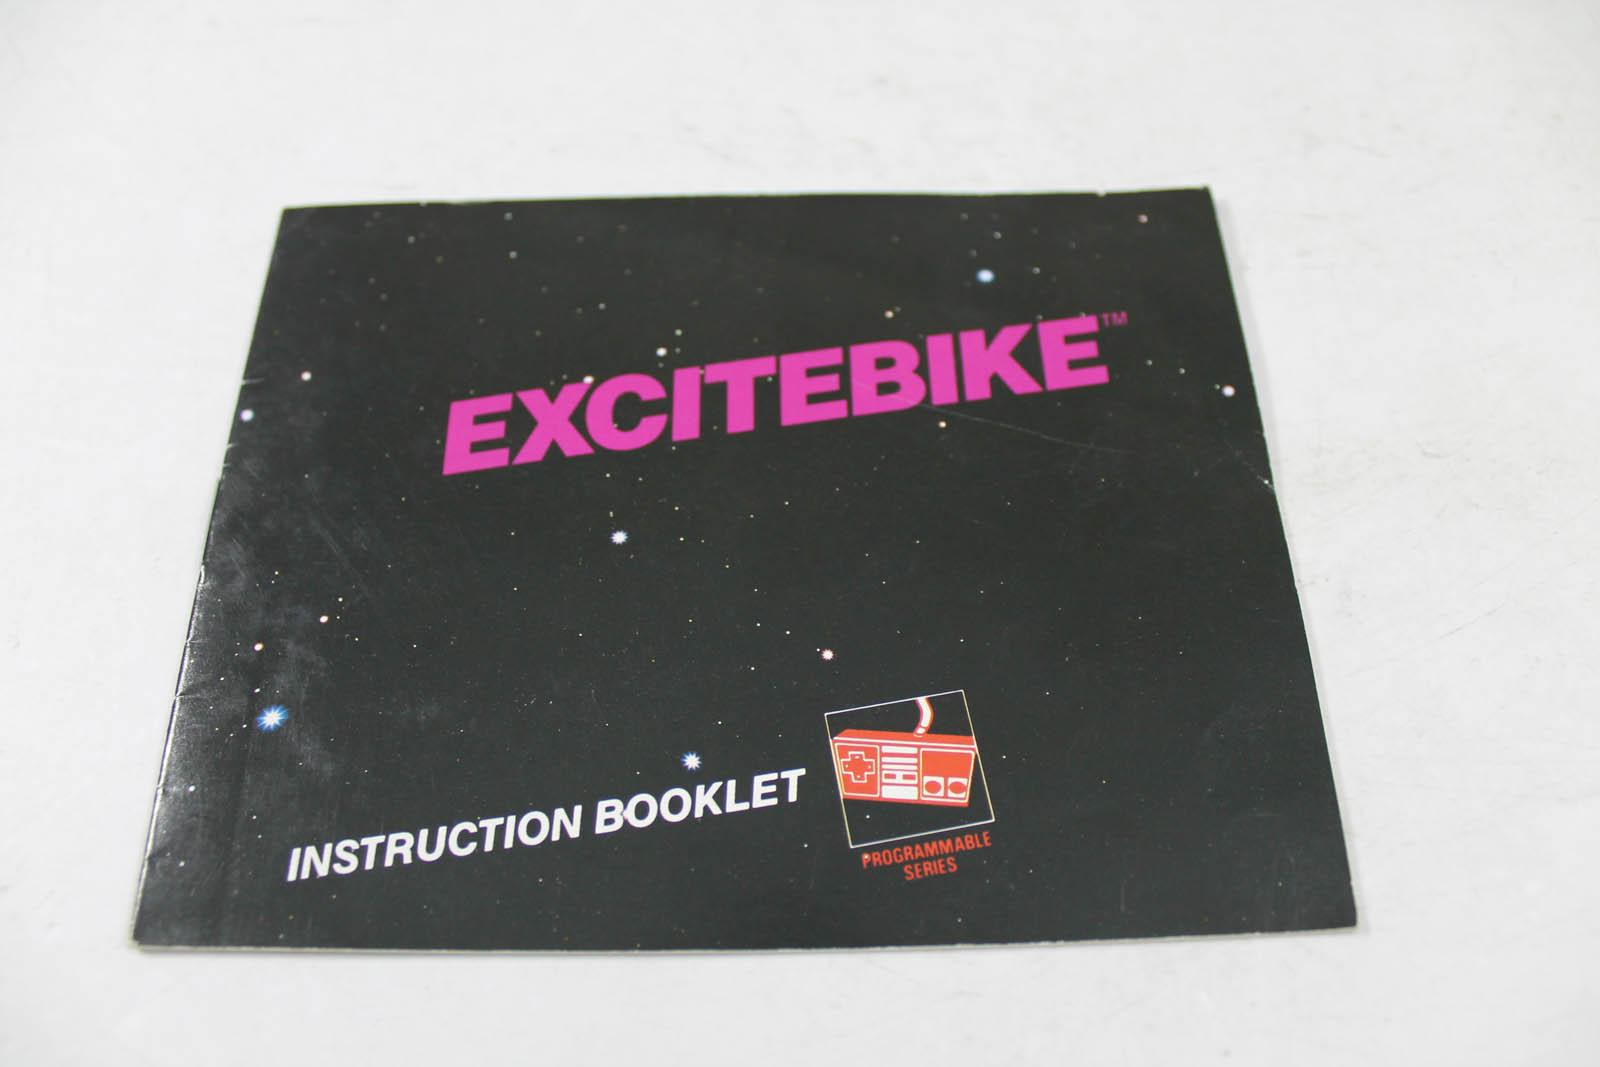 Manual - Excitebike - Fun Classic Nes Nintendo Excite Bike